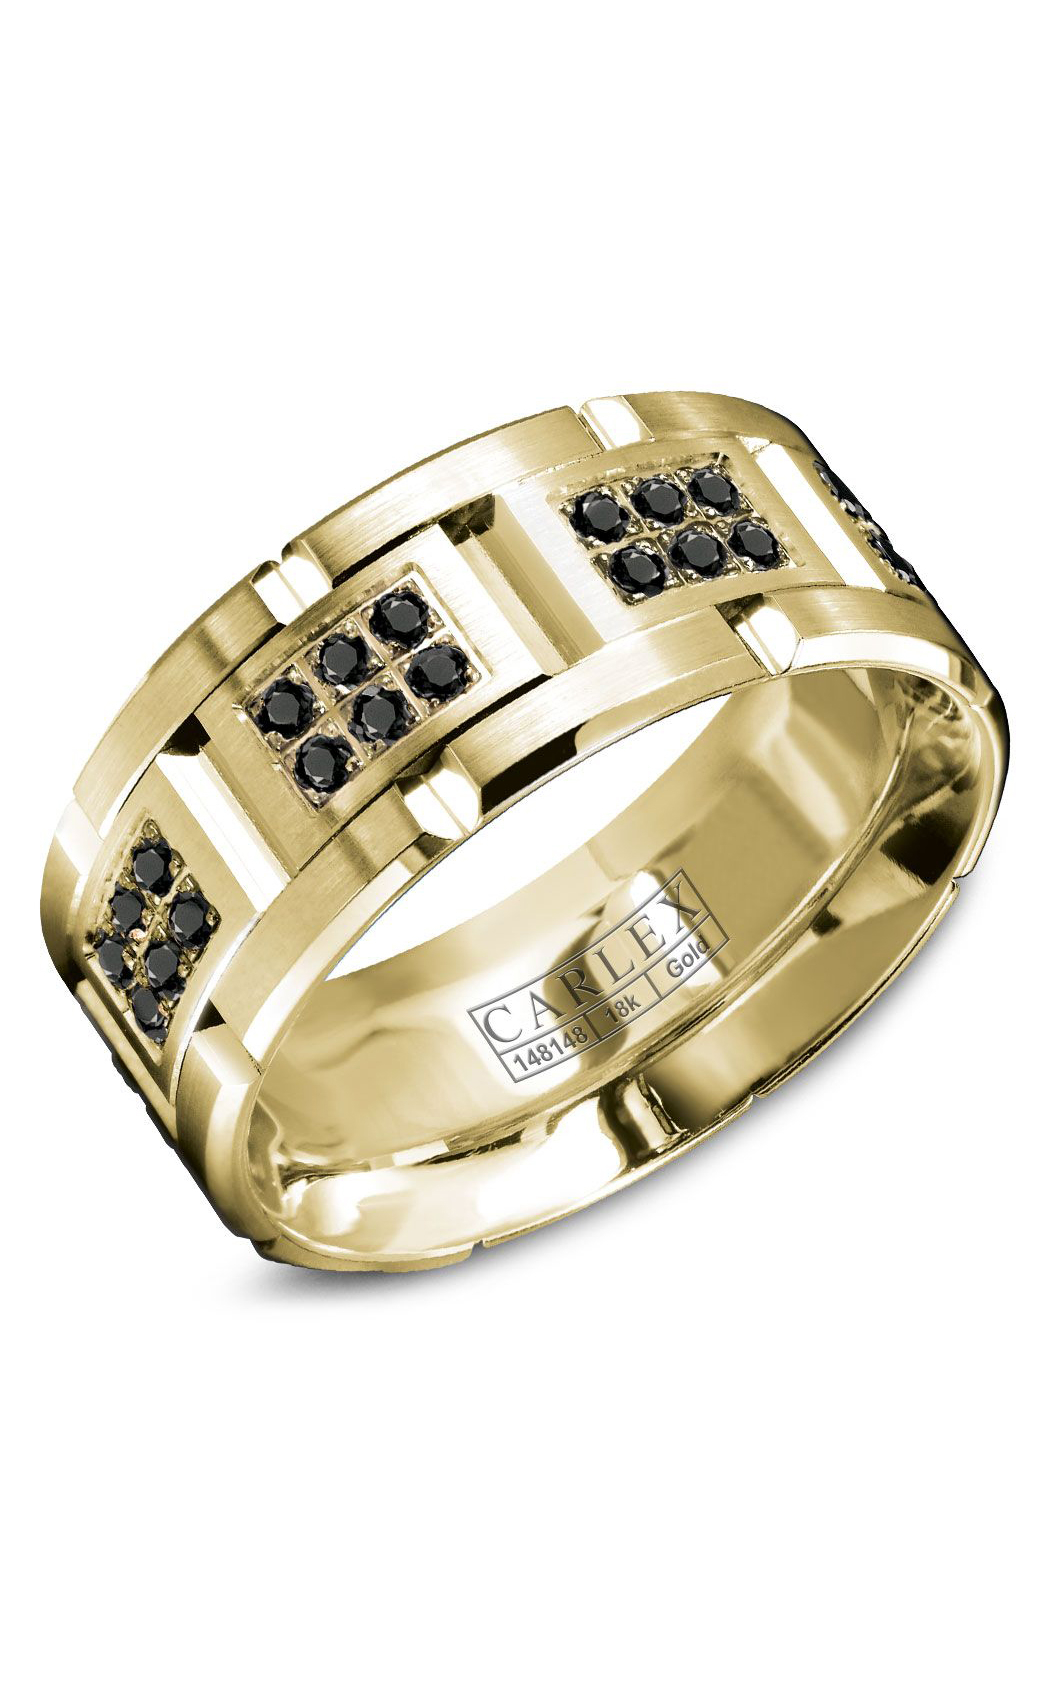 Carlex G1 Men's Wedding Band WB-9461 product image